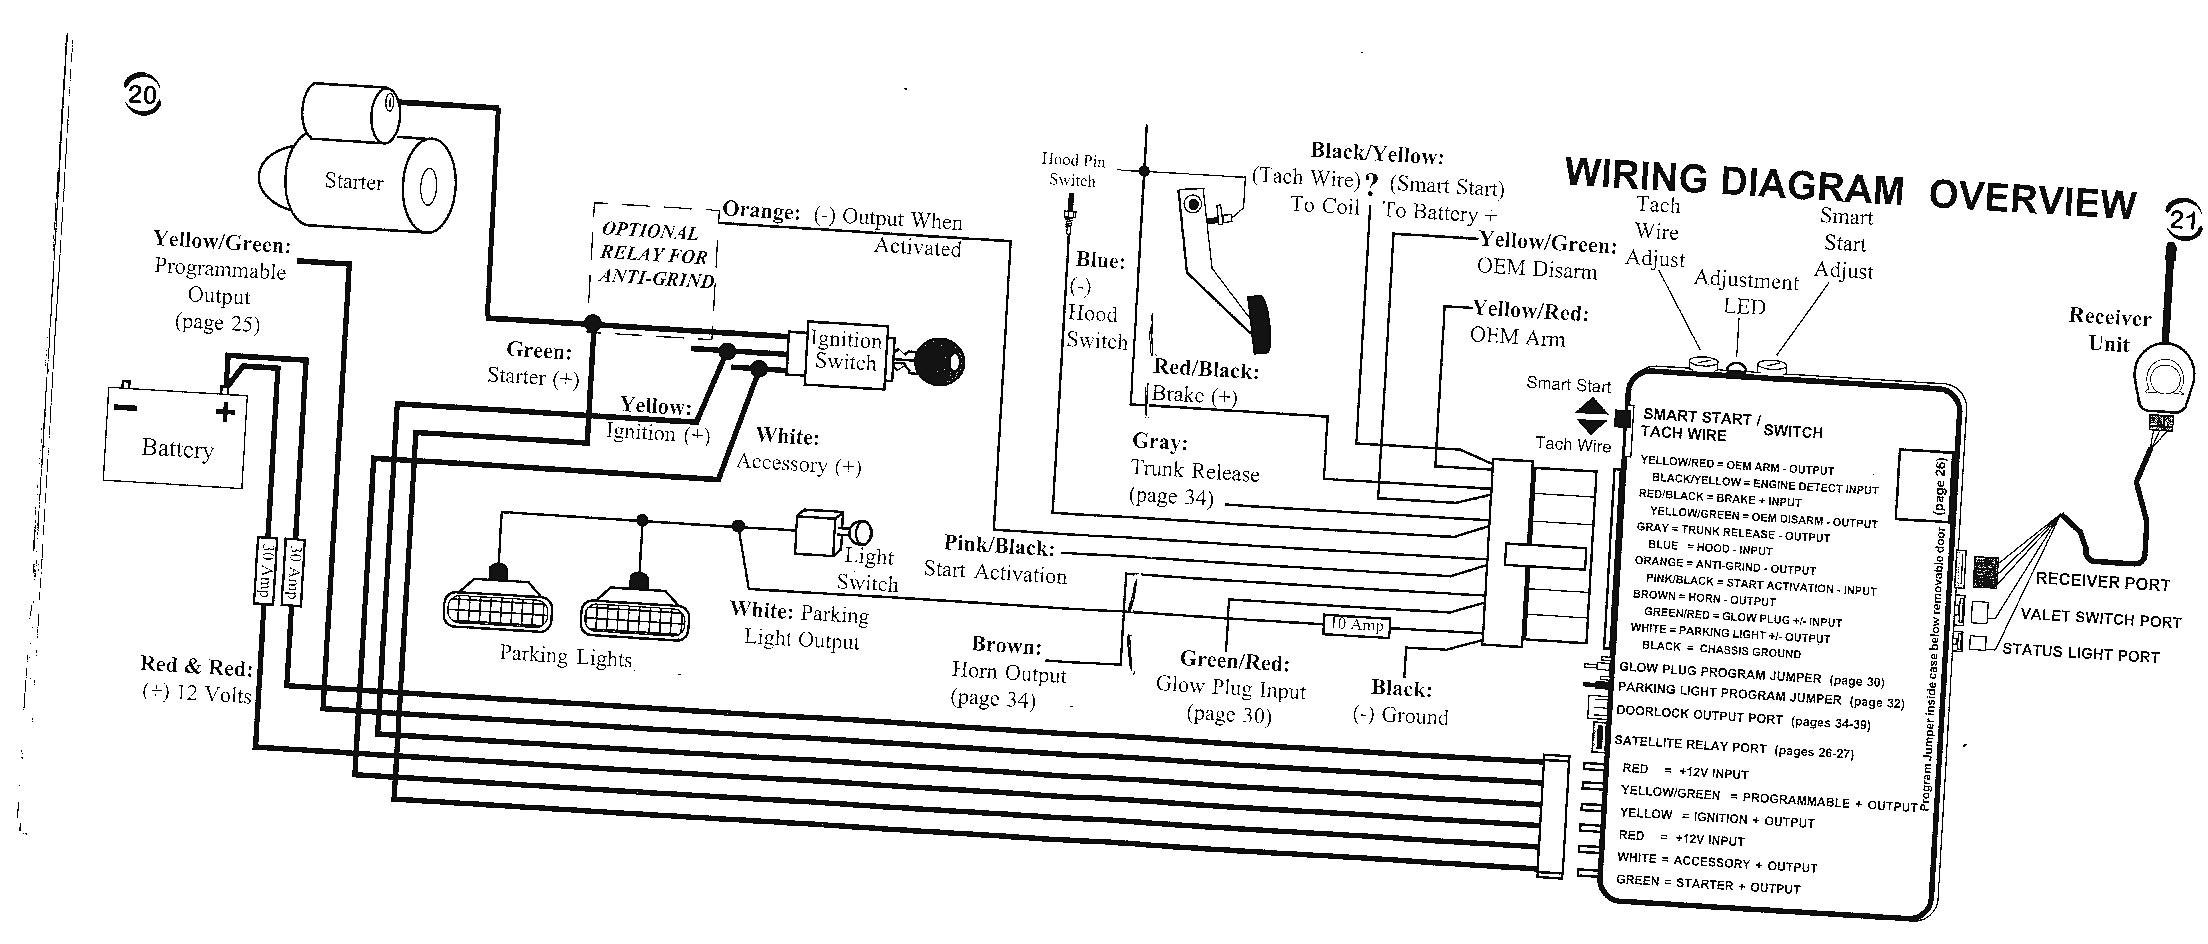 Car Alarm System Diagram Auto Brake System Diagram Viper 771xv Wiring Diagram Tech Support